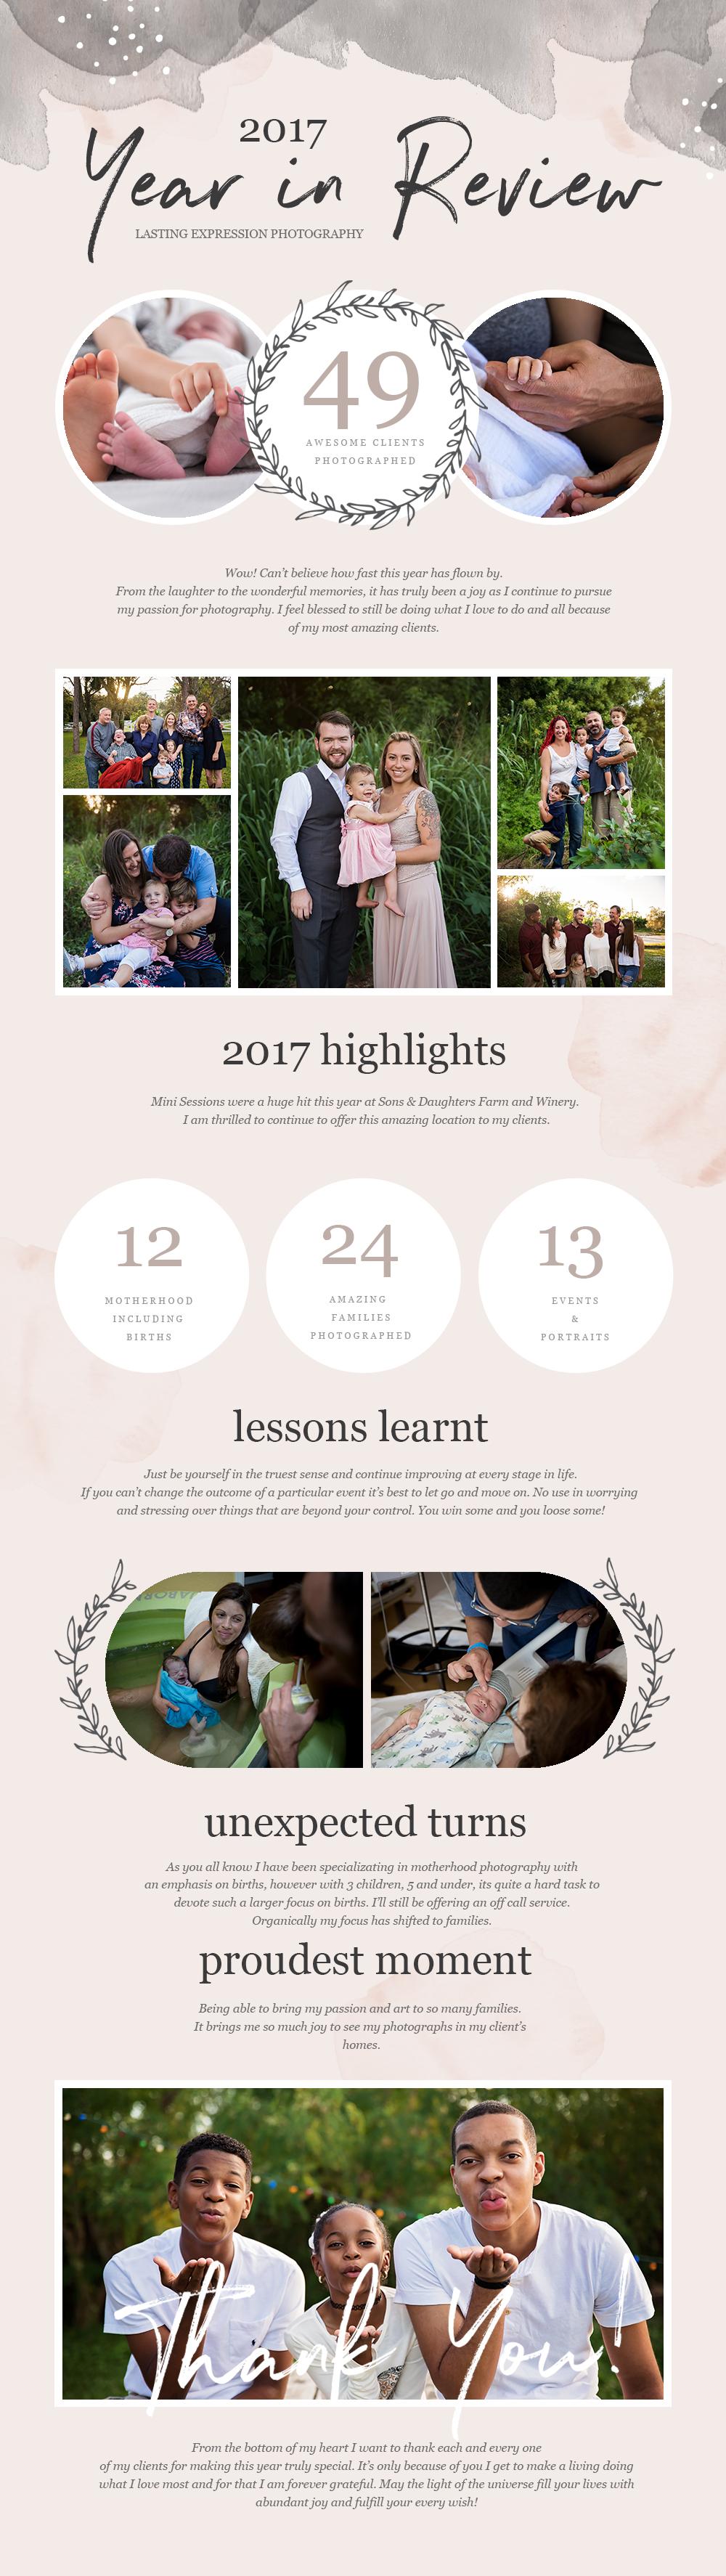 2017YearInReviewBlogPostBoard-.jpg